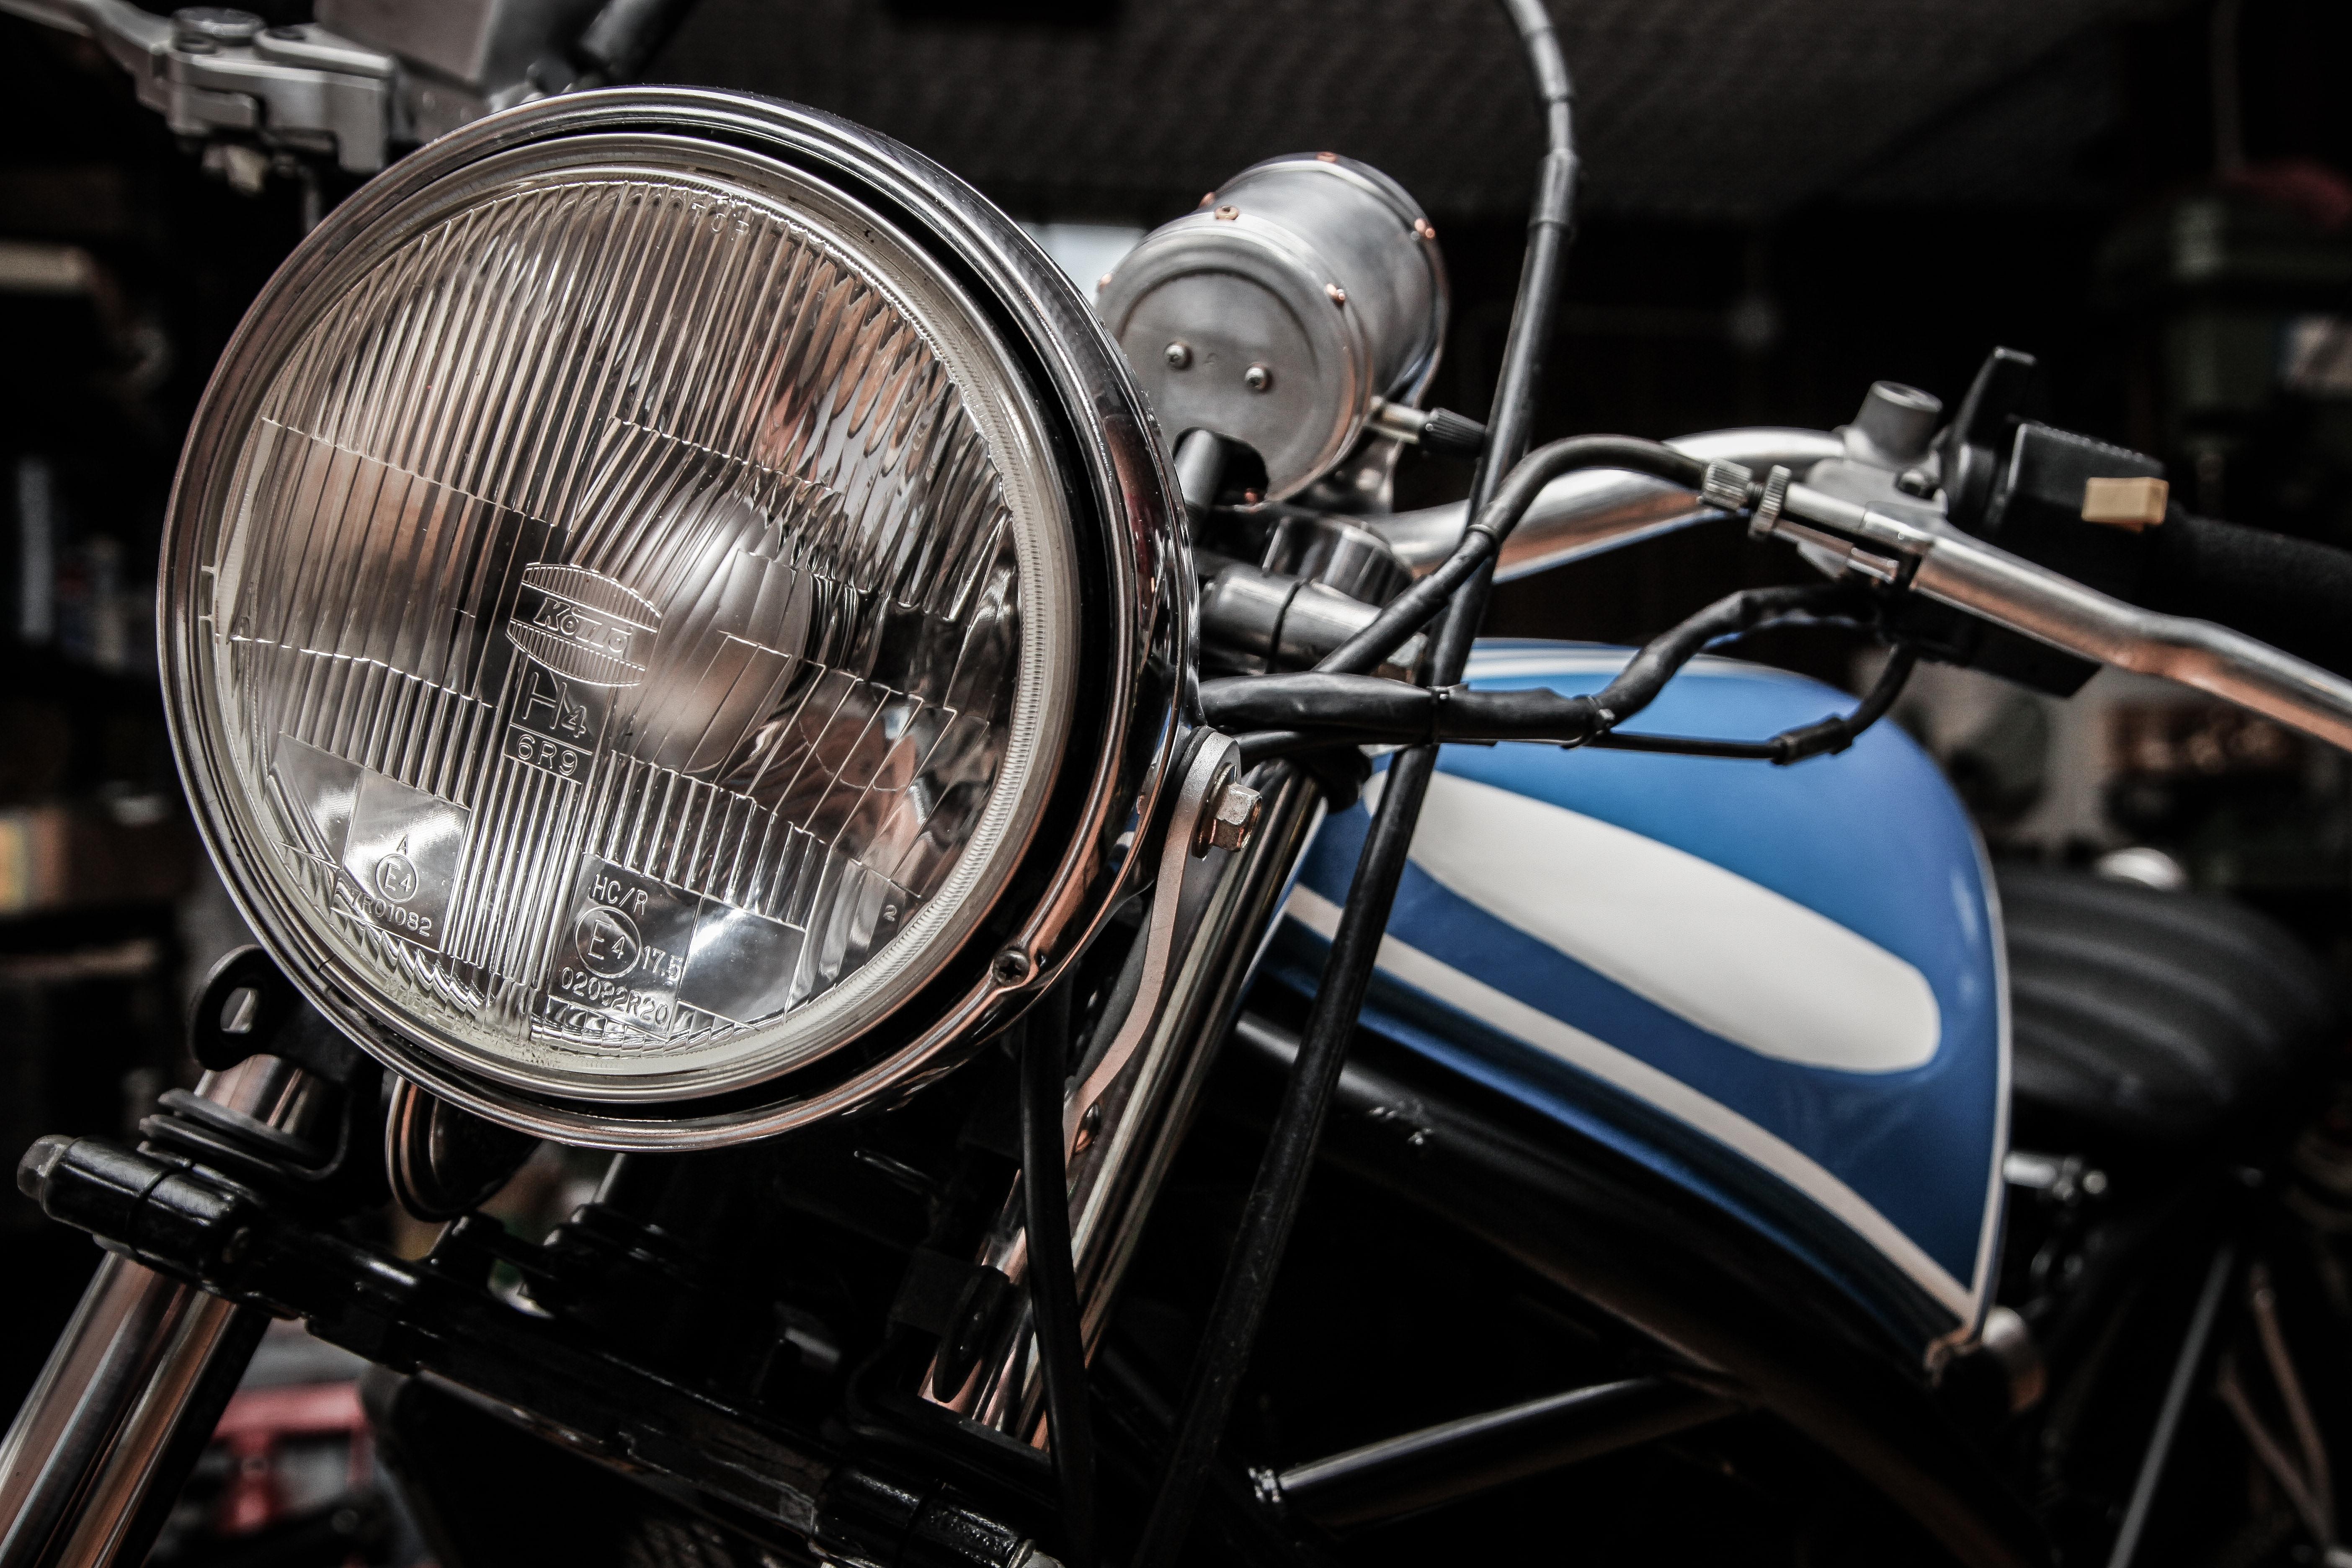 Winterizing your motorcycle